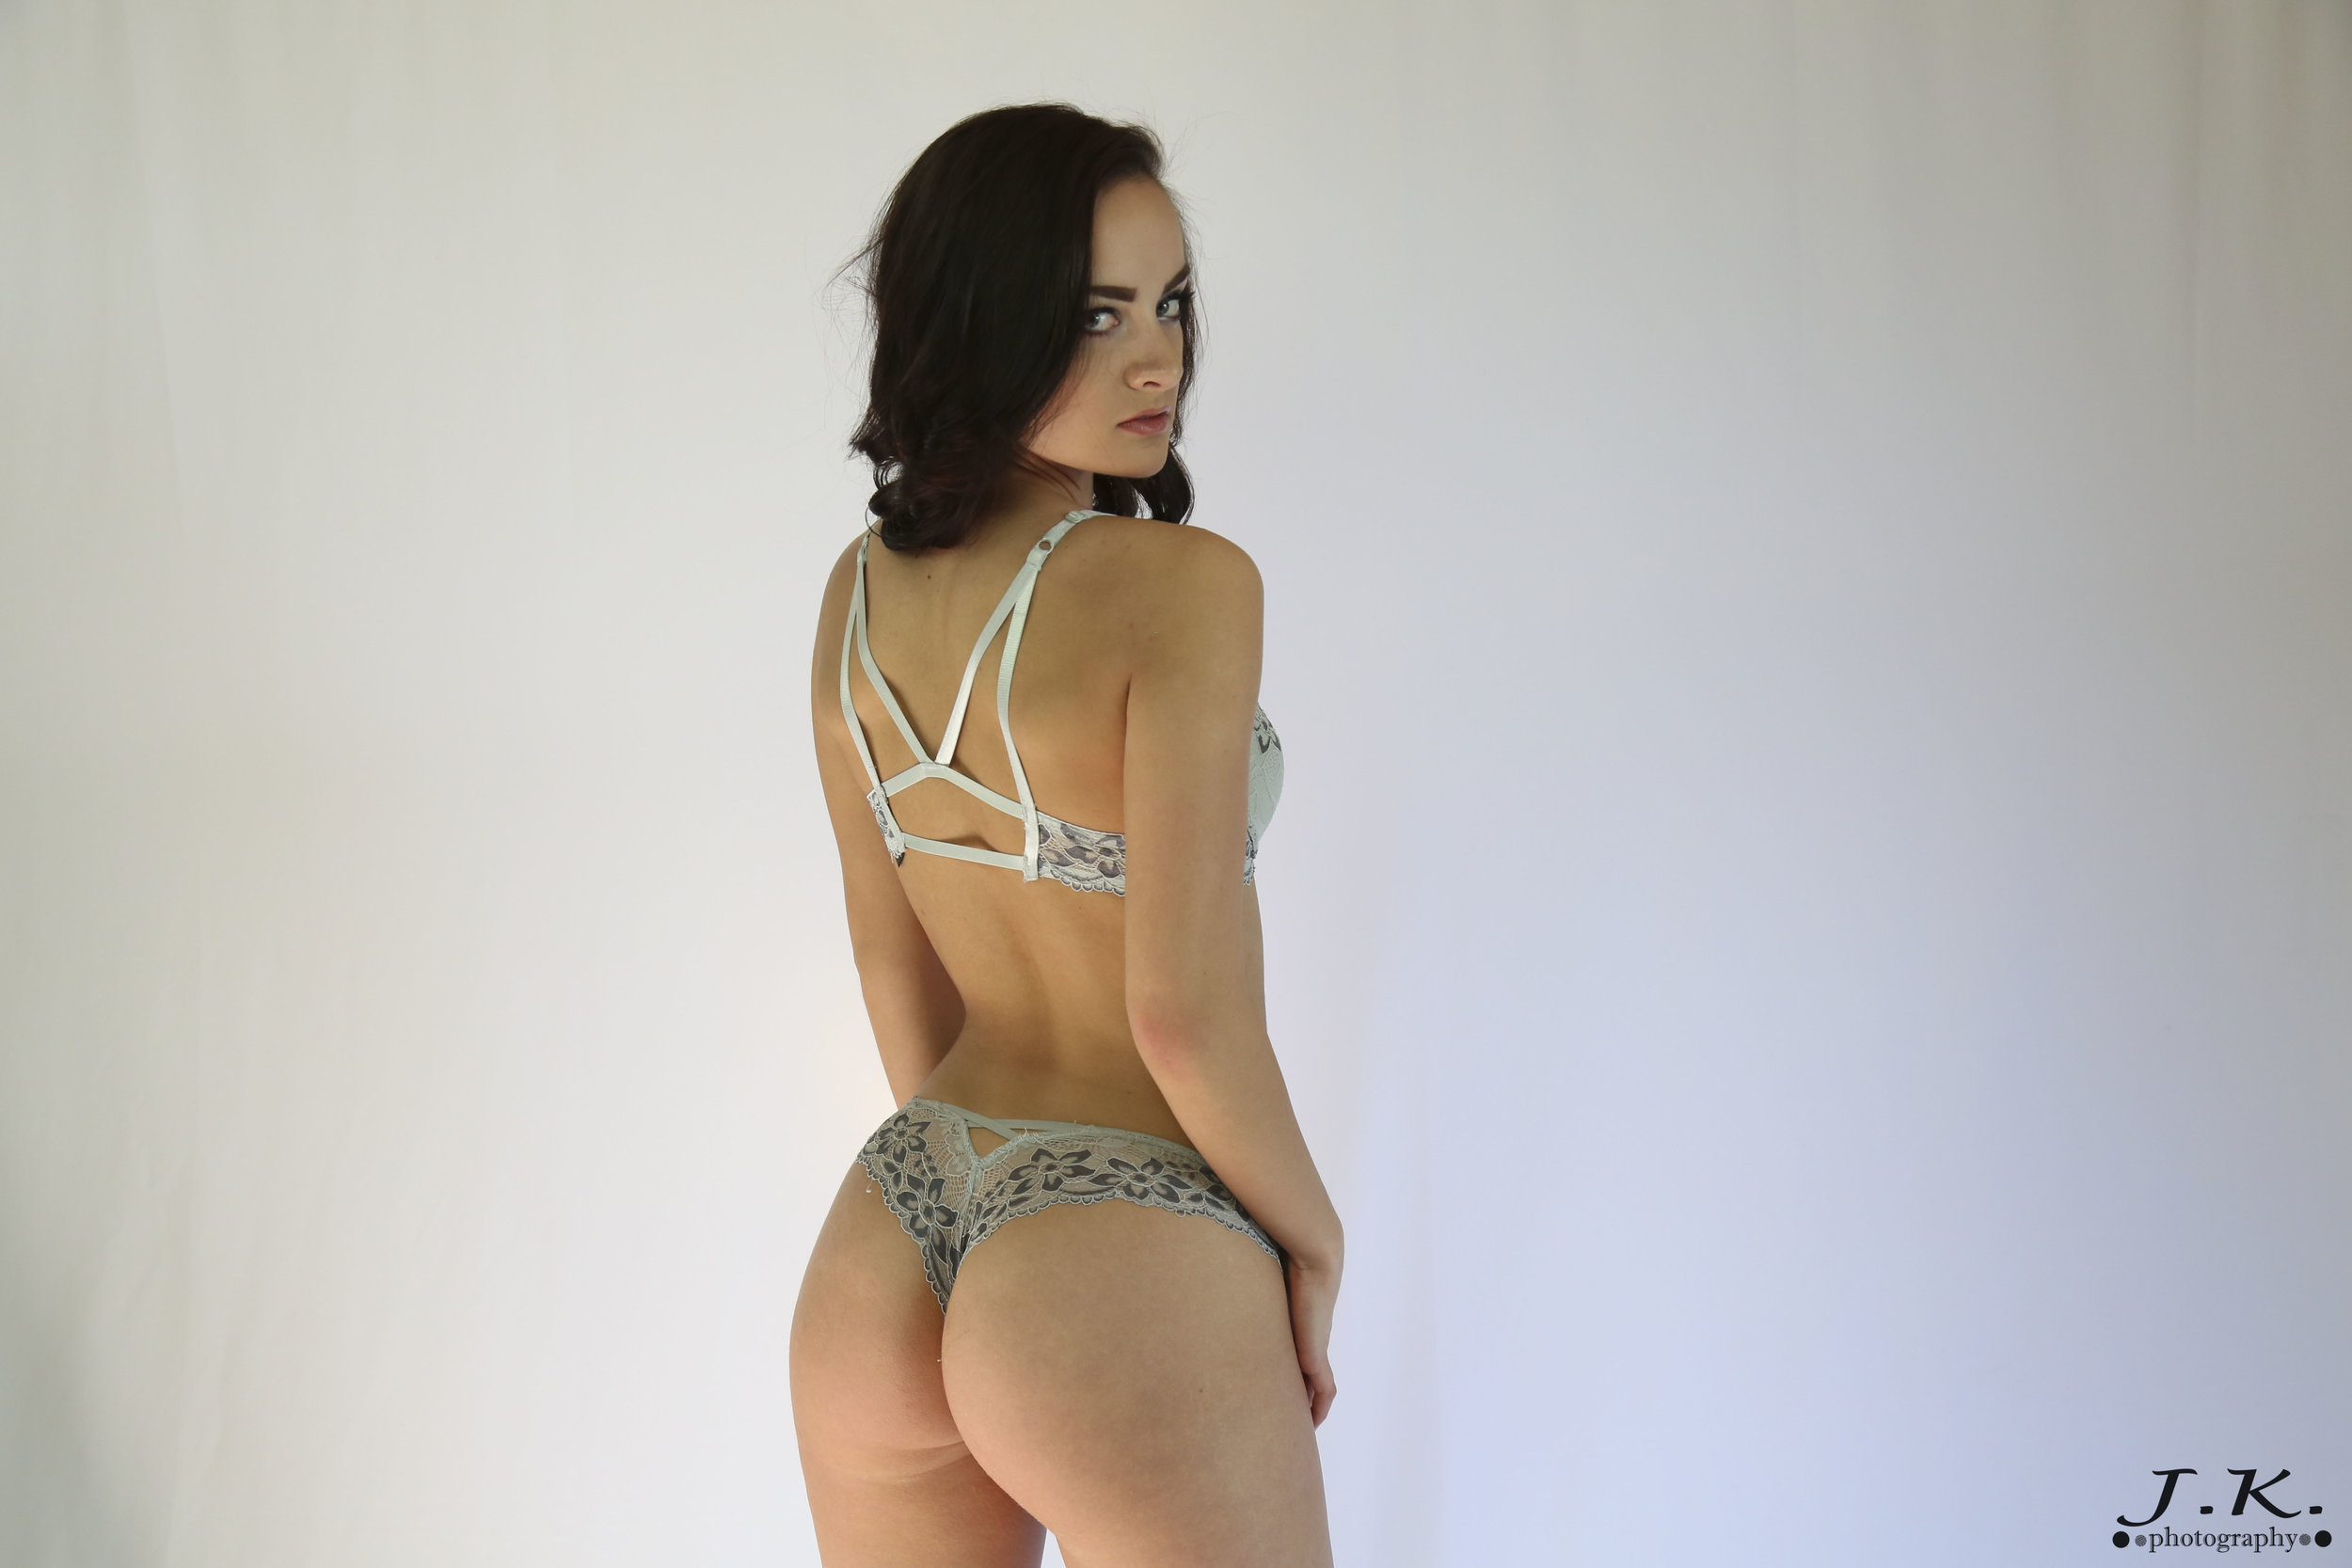 Maddi_Looking_Back_Gray_Lingerie.jpg